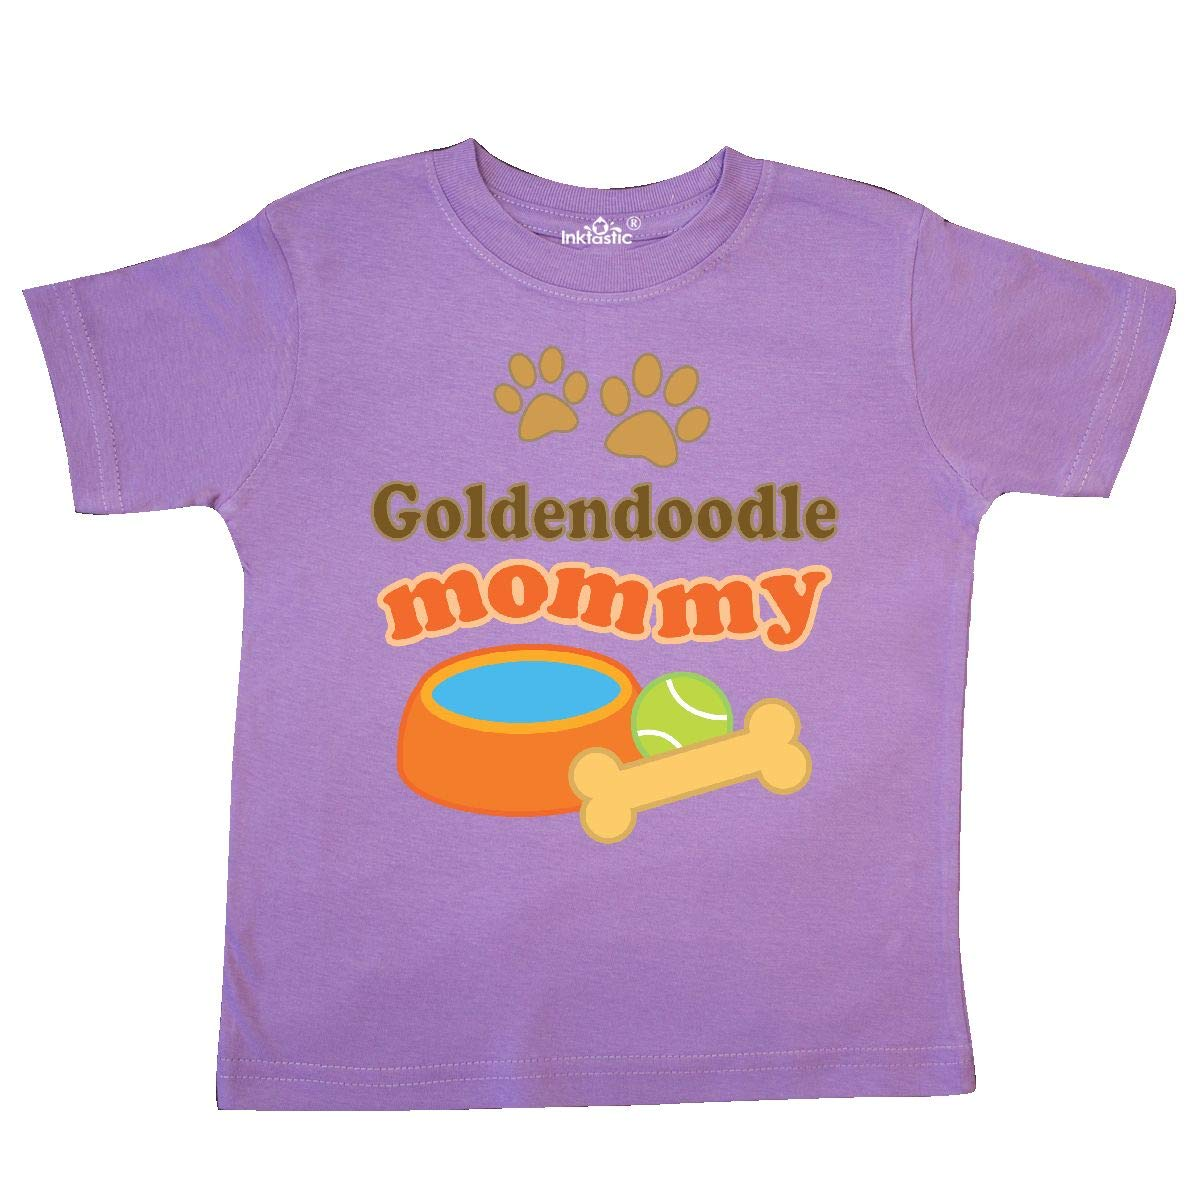 inktastic Goldendoodle Mommy Toddler T-Shirt